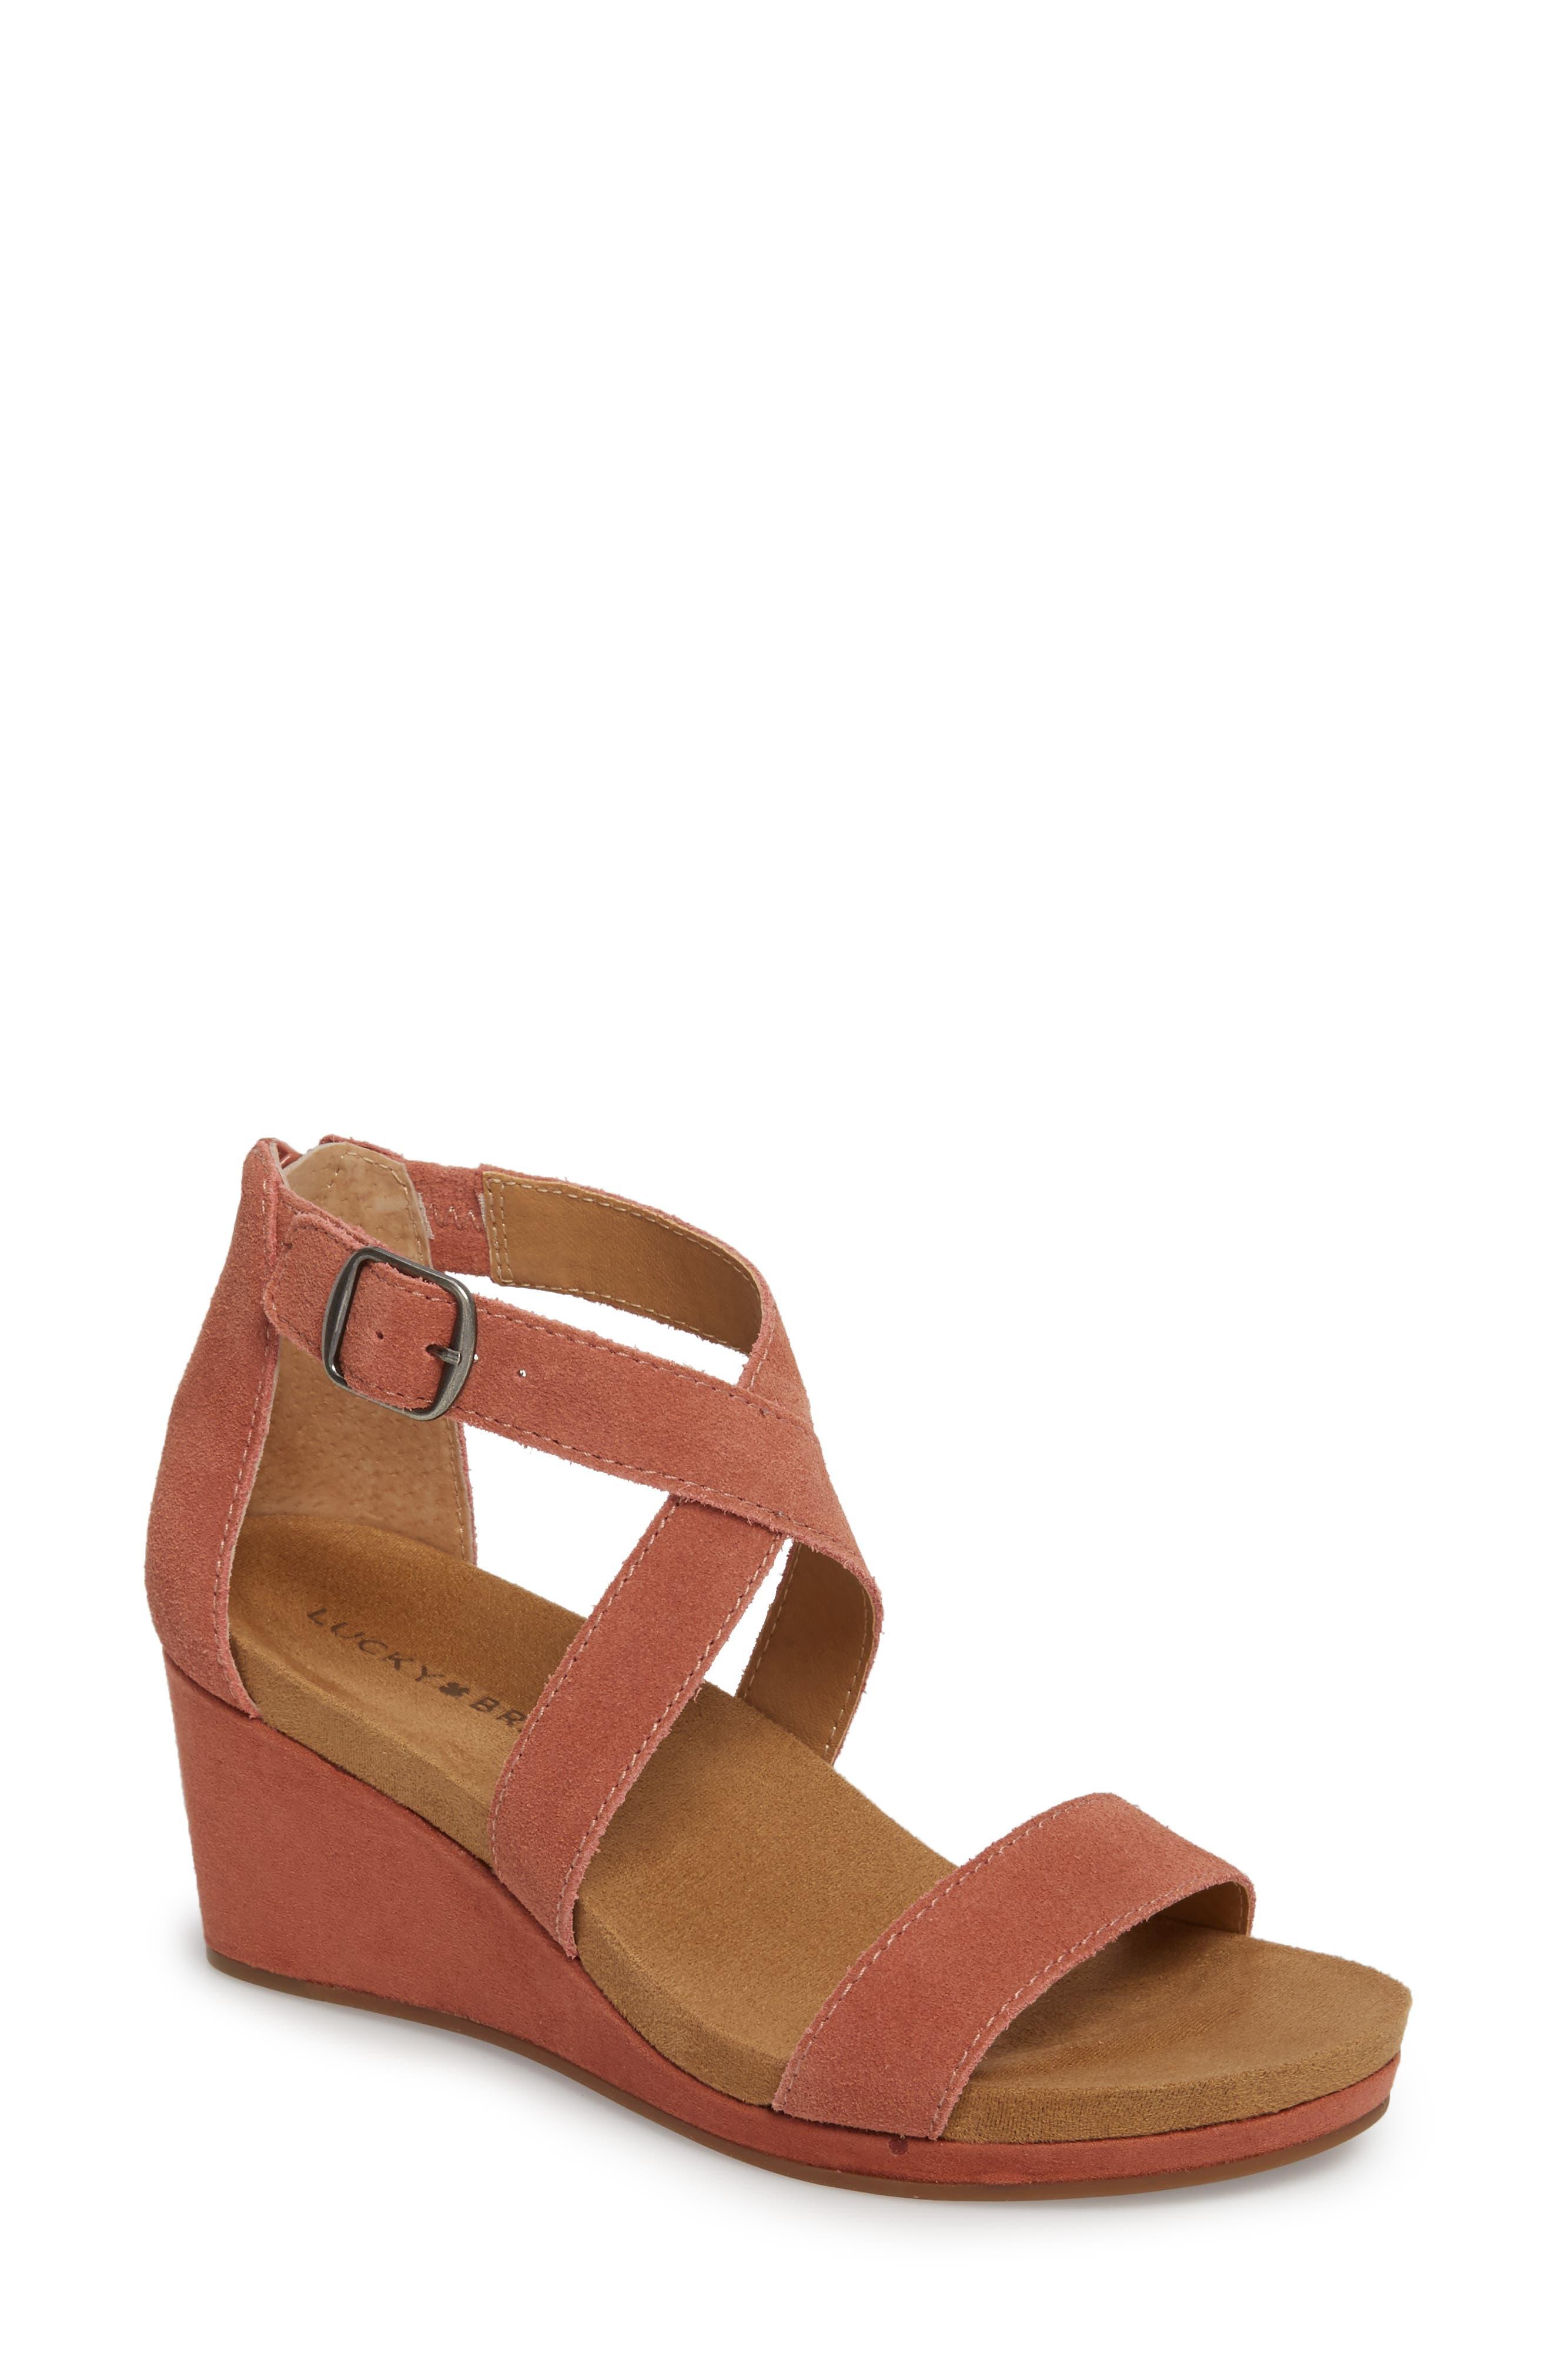 Kenadee Wedge Sandal,                         Main,                         color, Canyon Rose Suede